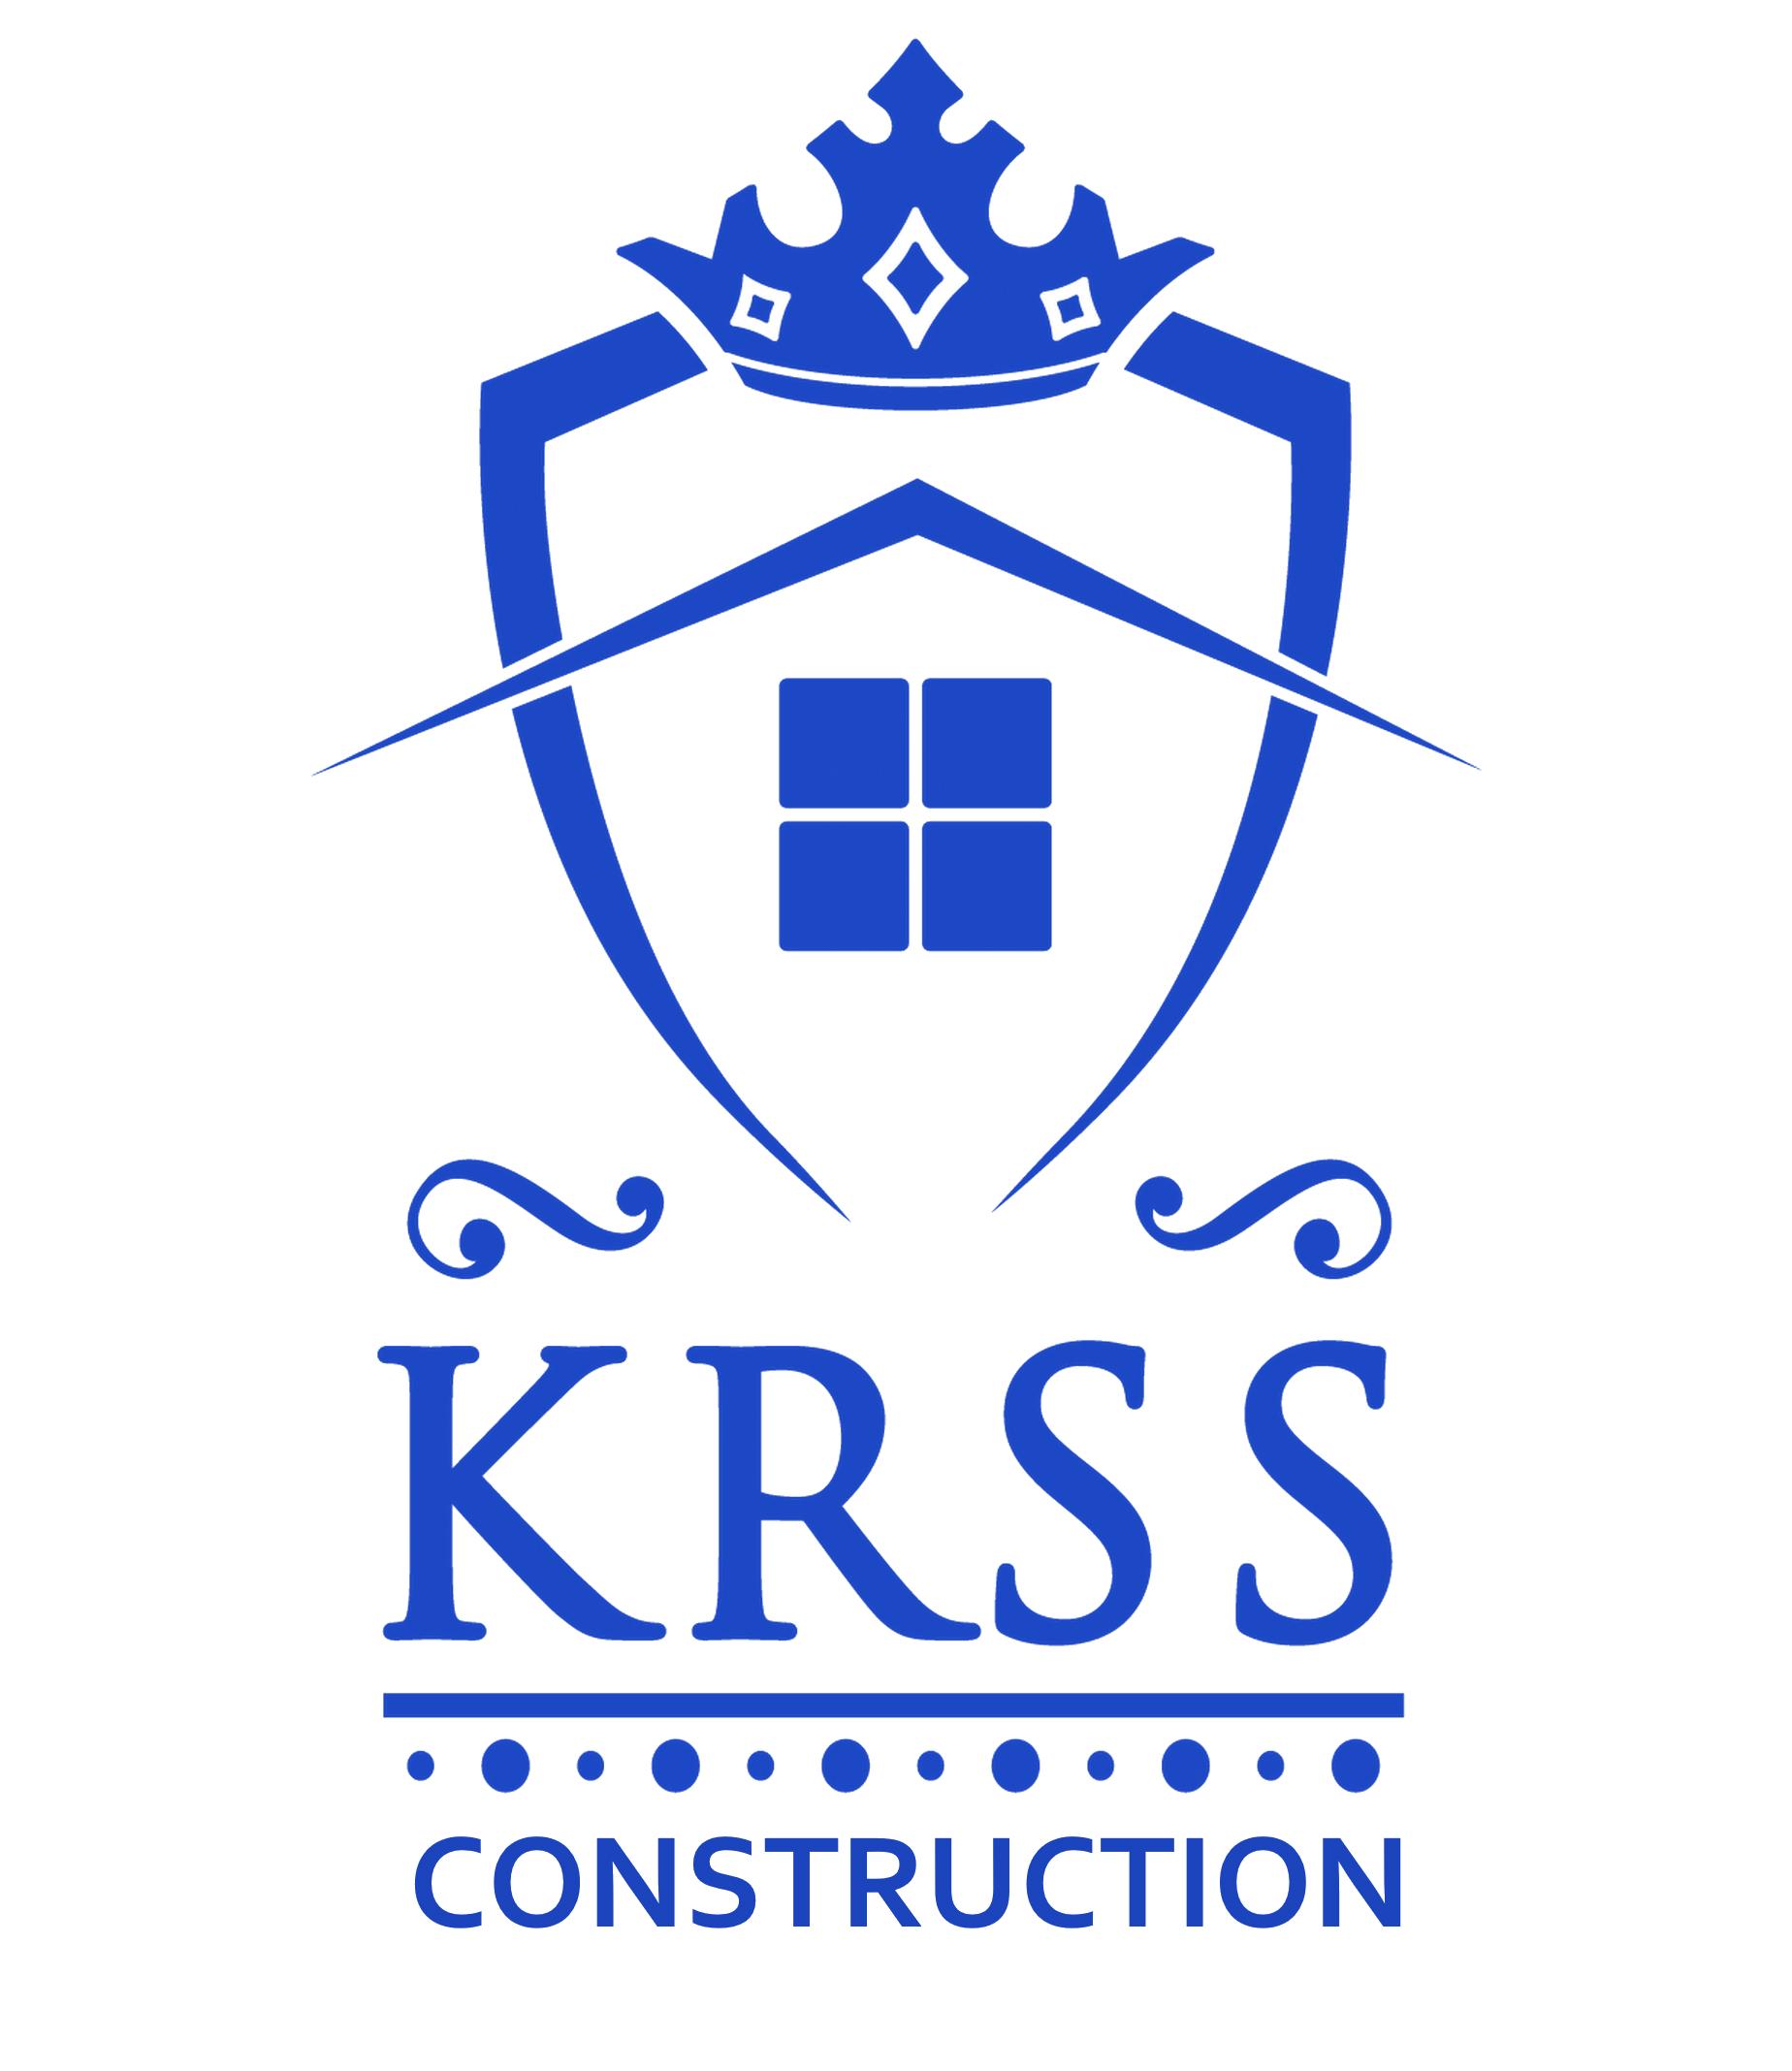 KRSS Construction